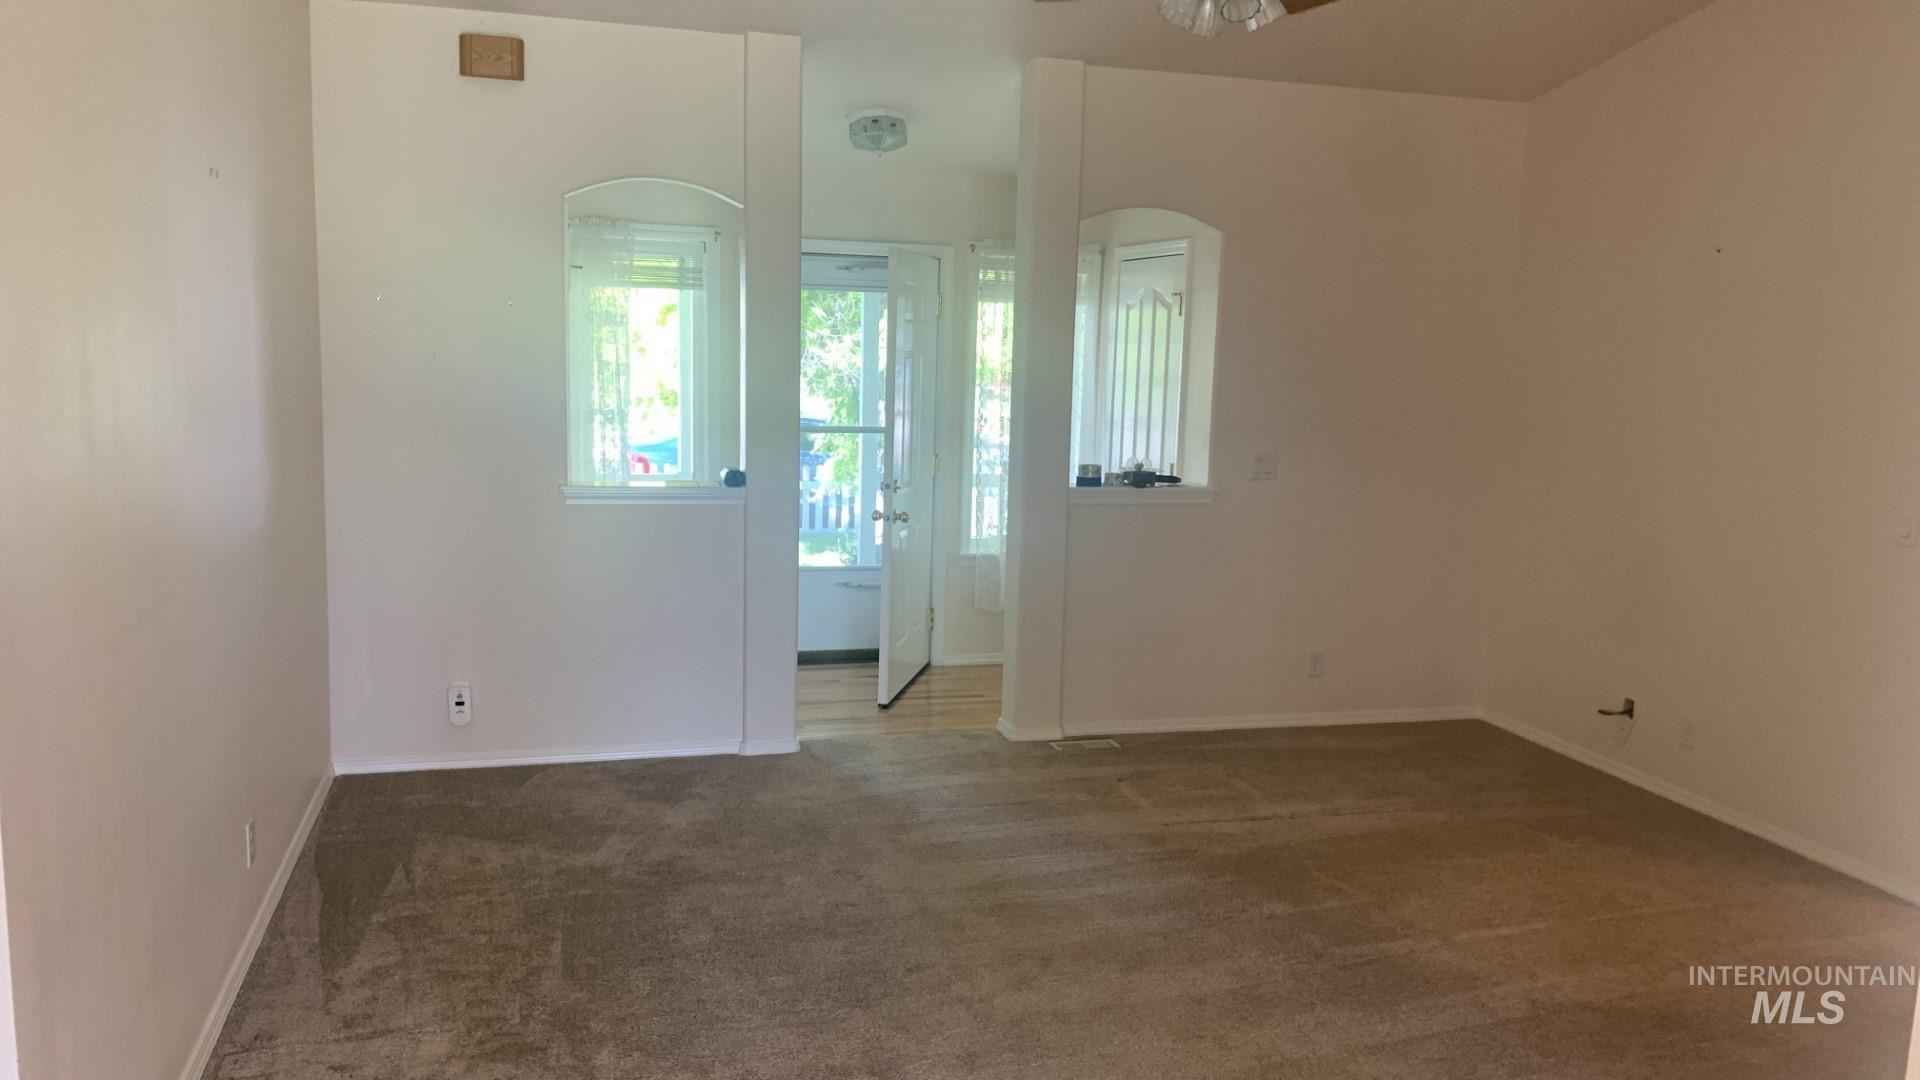 Photo of 1400 Lara Place, Mountain Home, ID 83647 (MLS # 98806907)